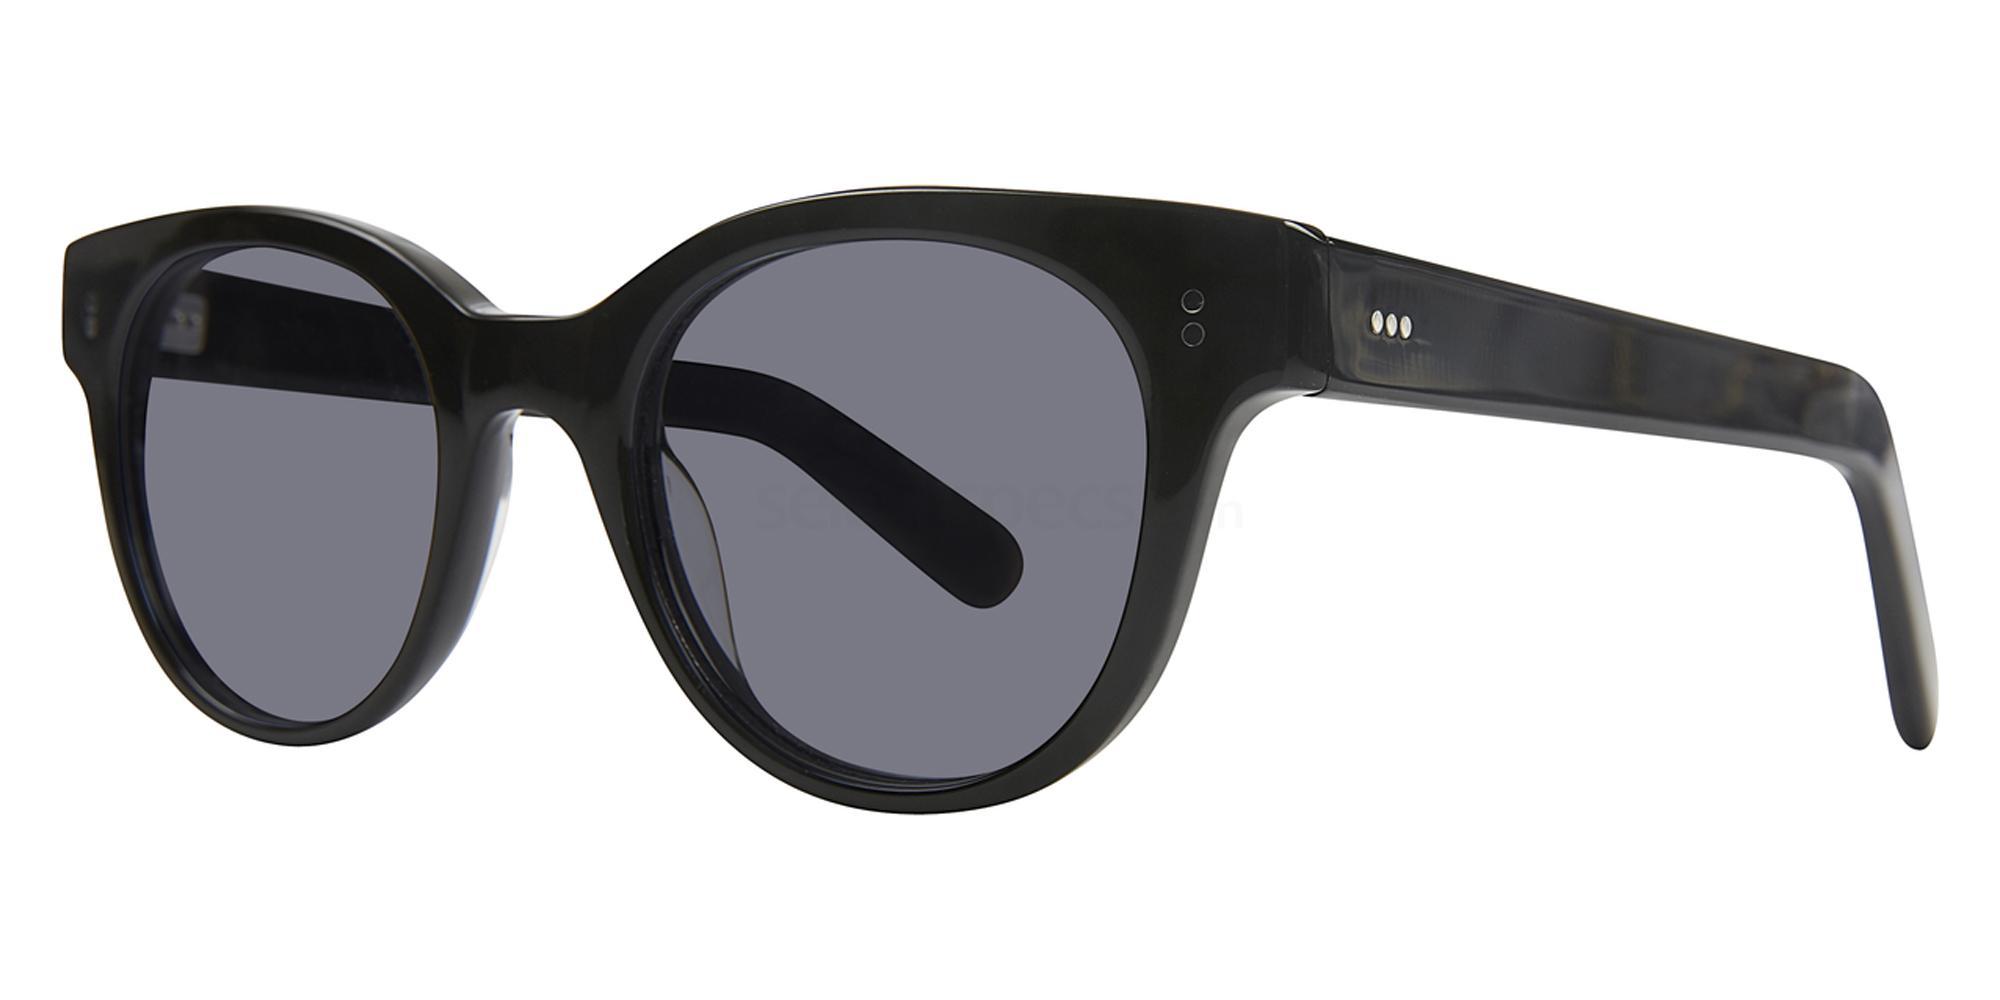 C1 Wimbledon Sunglasses, Joseph